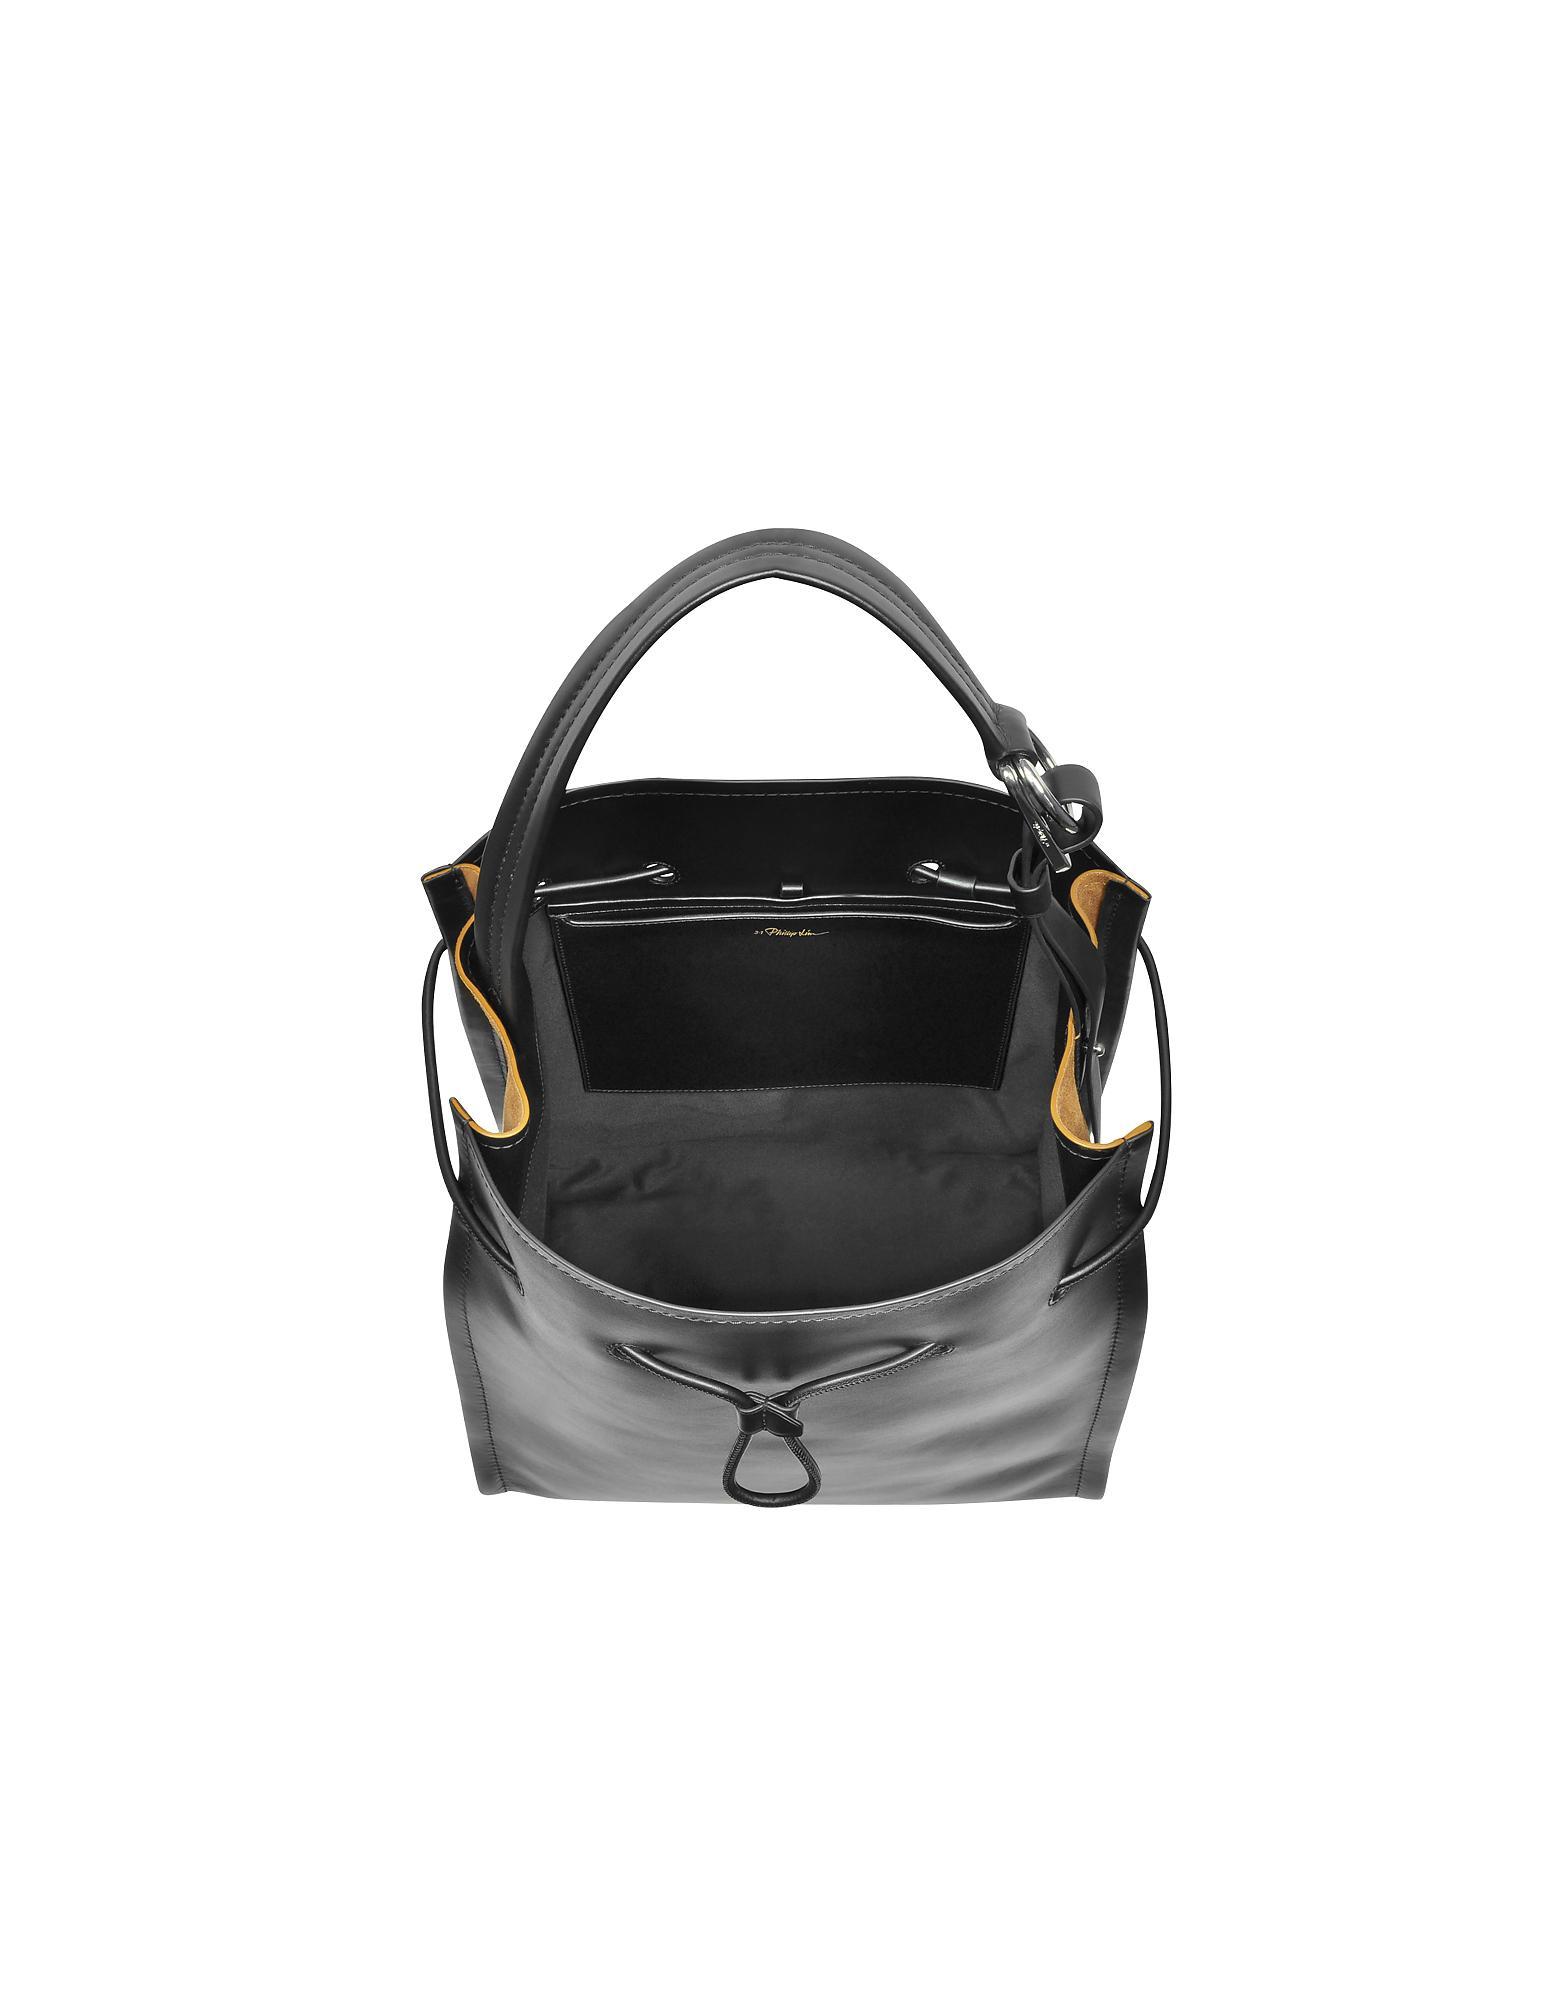 8fcf5fa27bf9 3.1 Phillip Lim Black Leather And Cinnamon Suede Hudson Market in ...